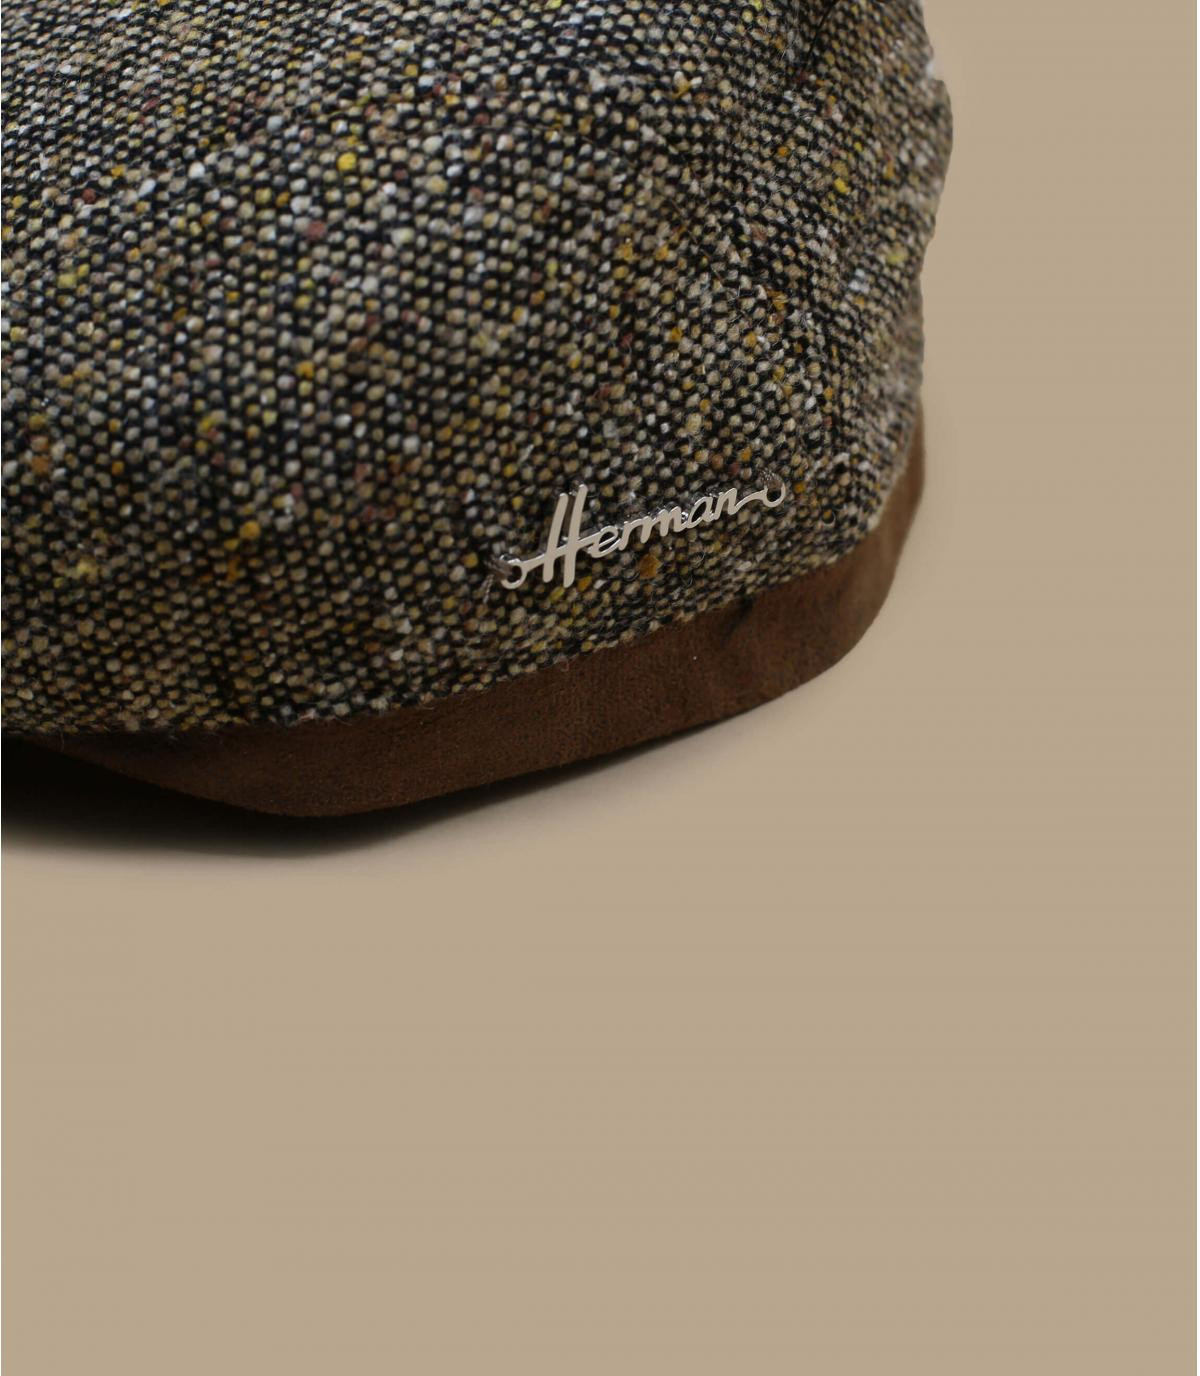 Details Range Wool taupe - afbeeling 2